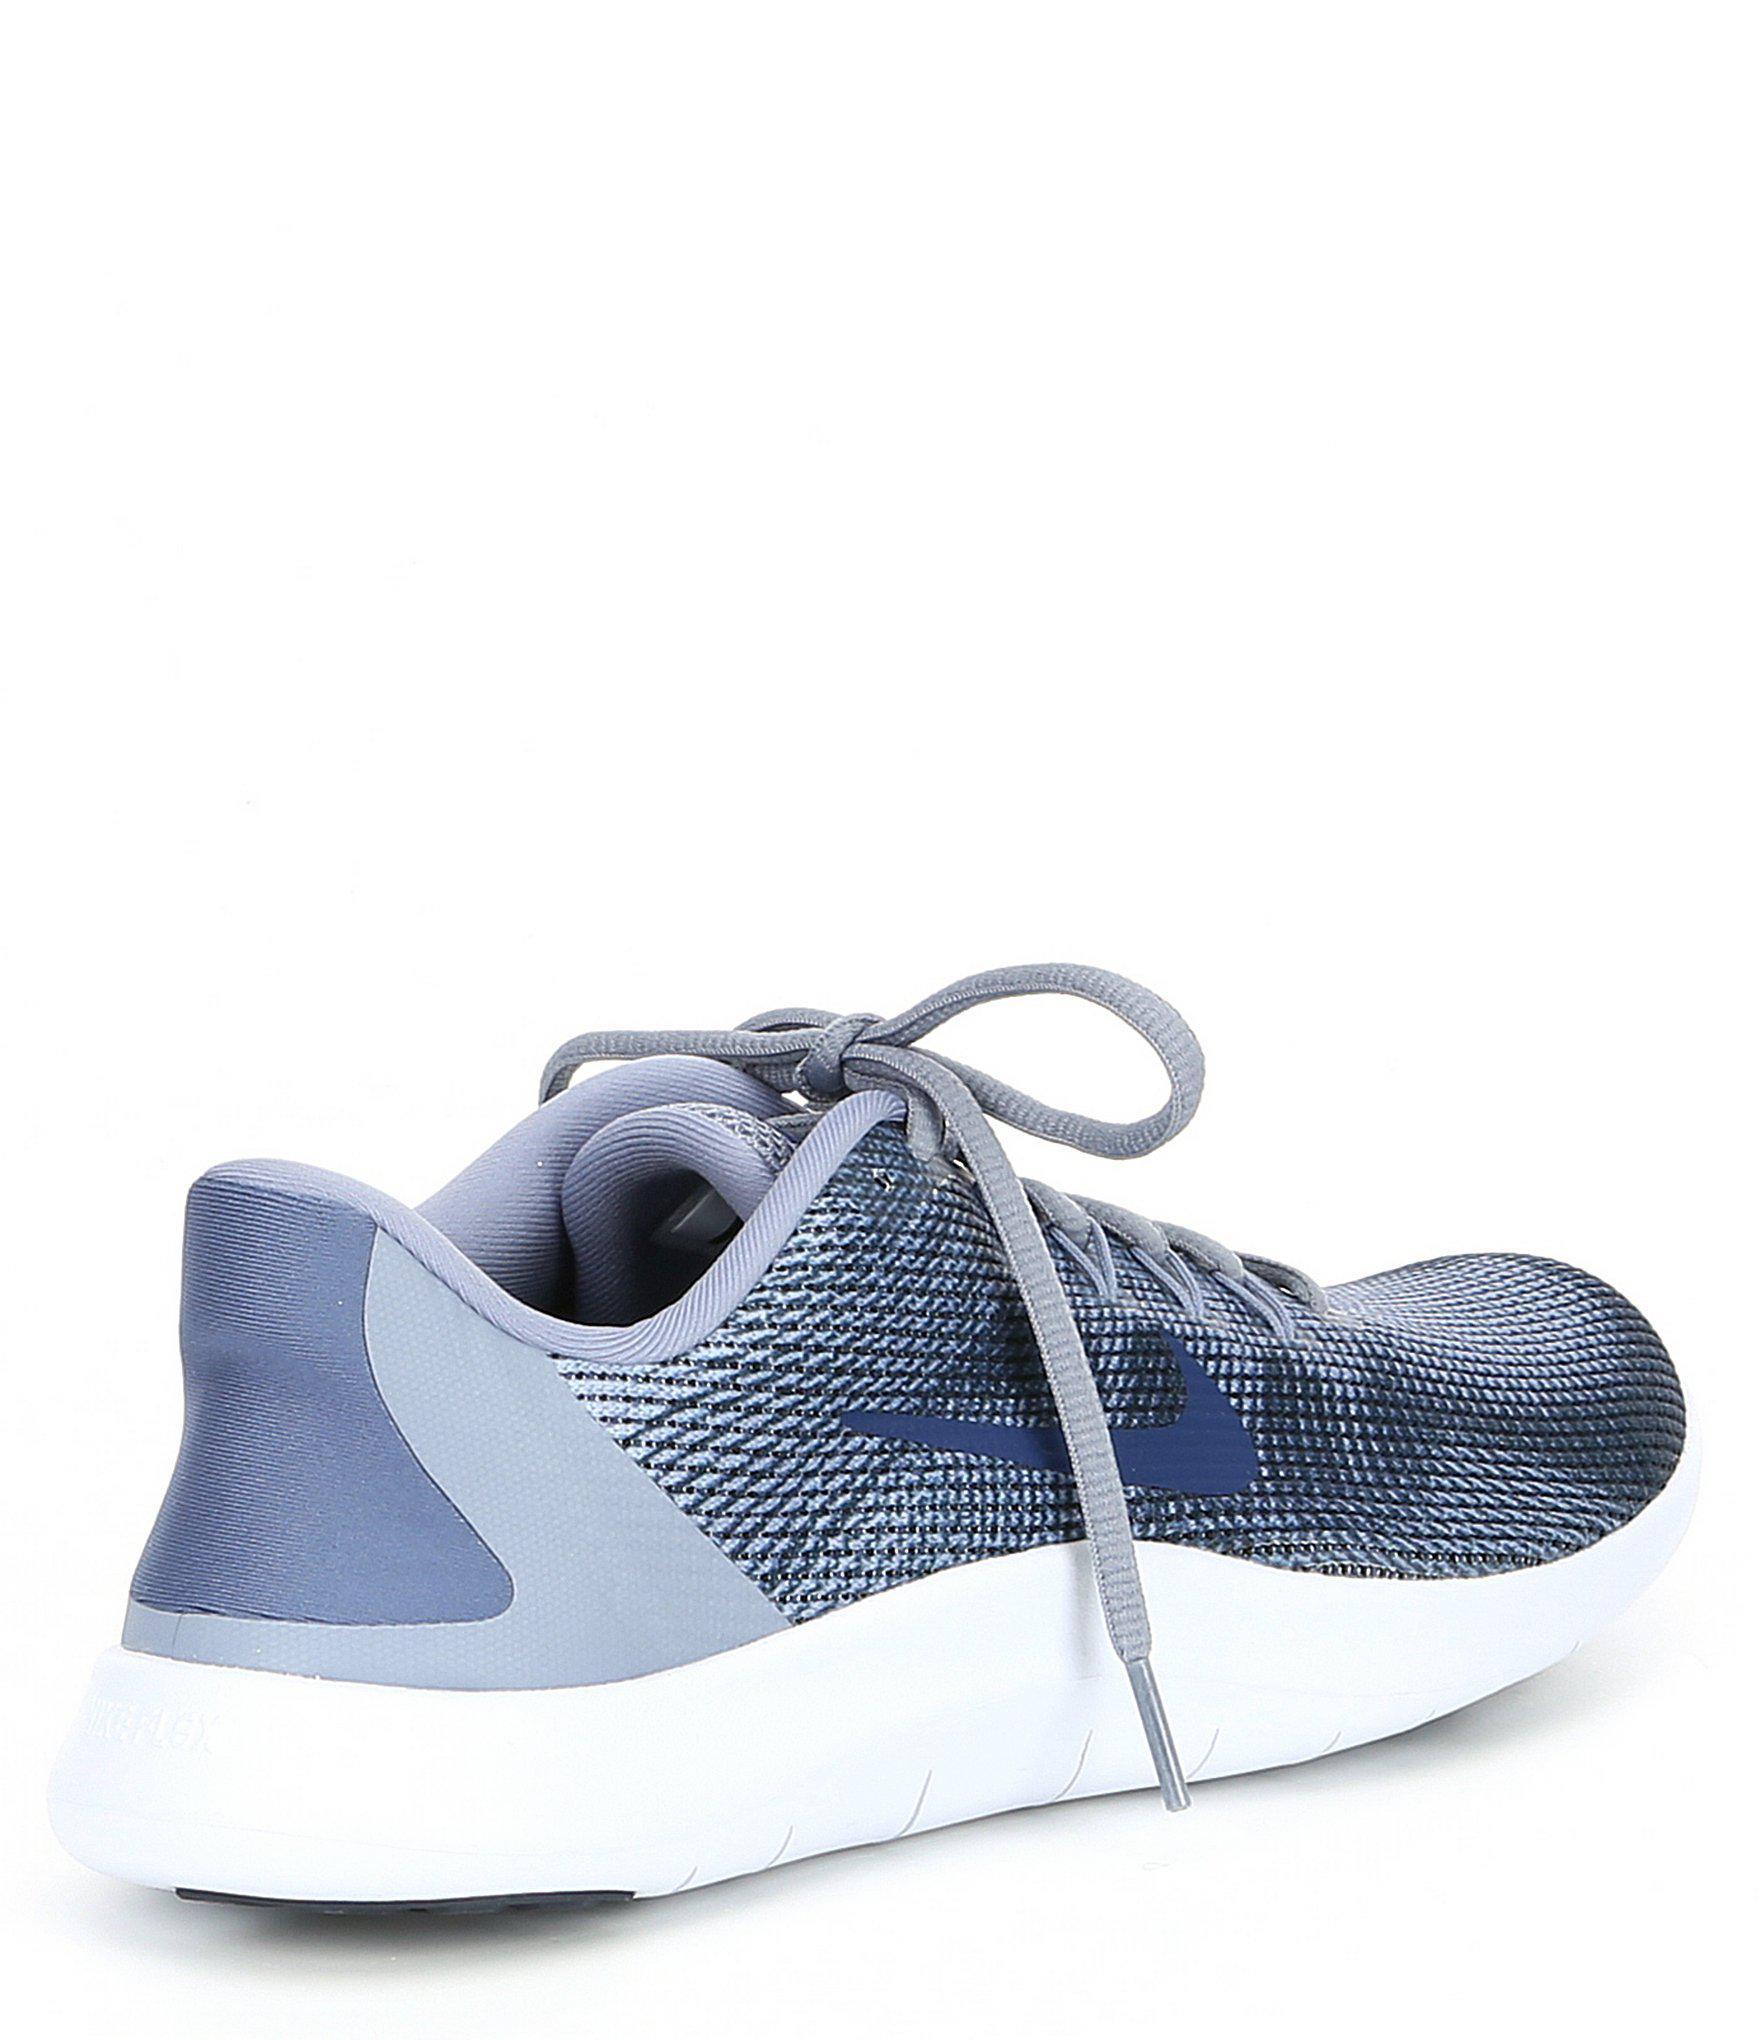 dfe860f8e8f Nike - Blue Men s Flex 2018 Rn Running Shoes for Men - Lyst. View fullscreen